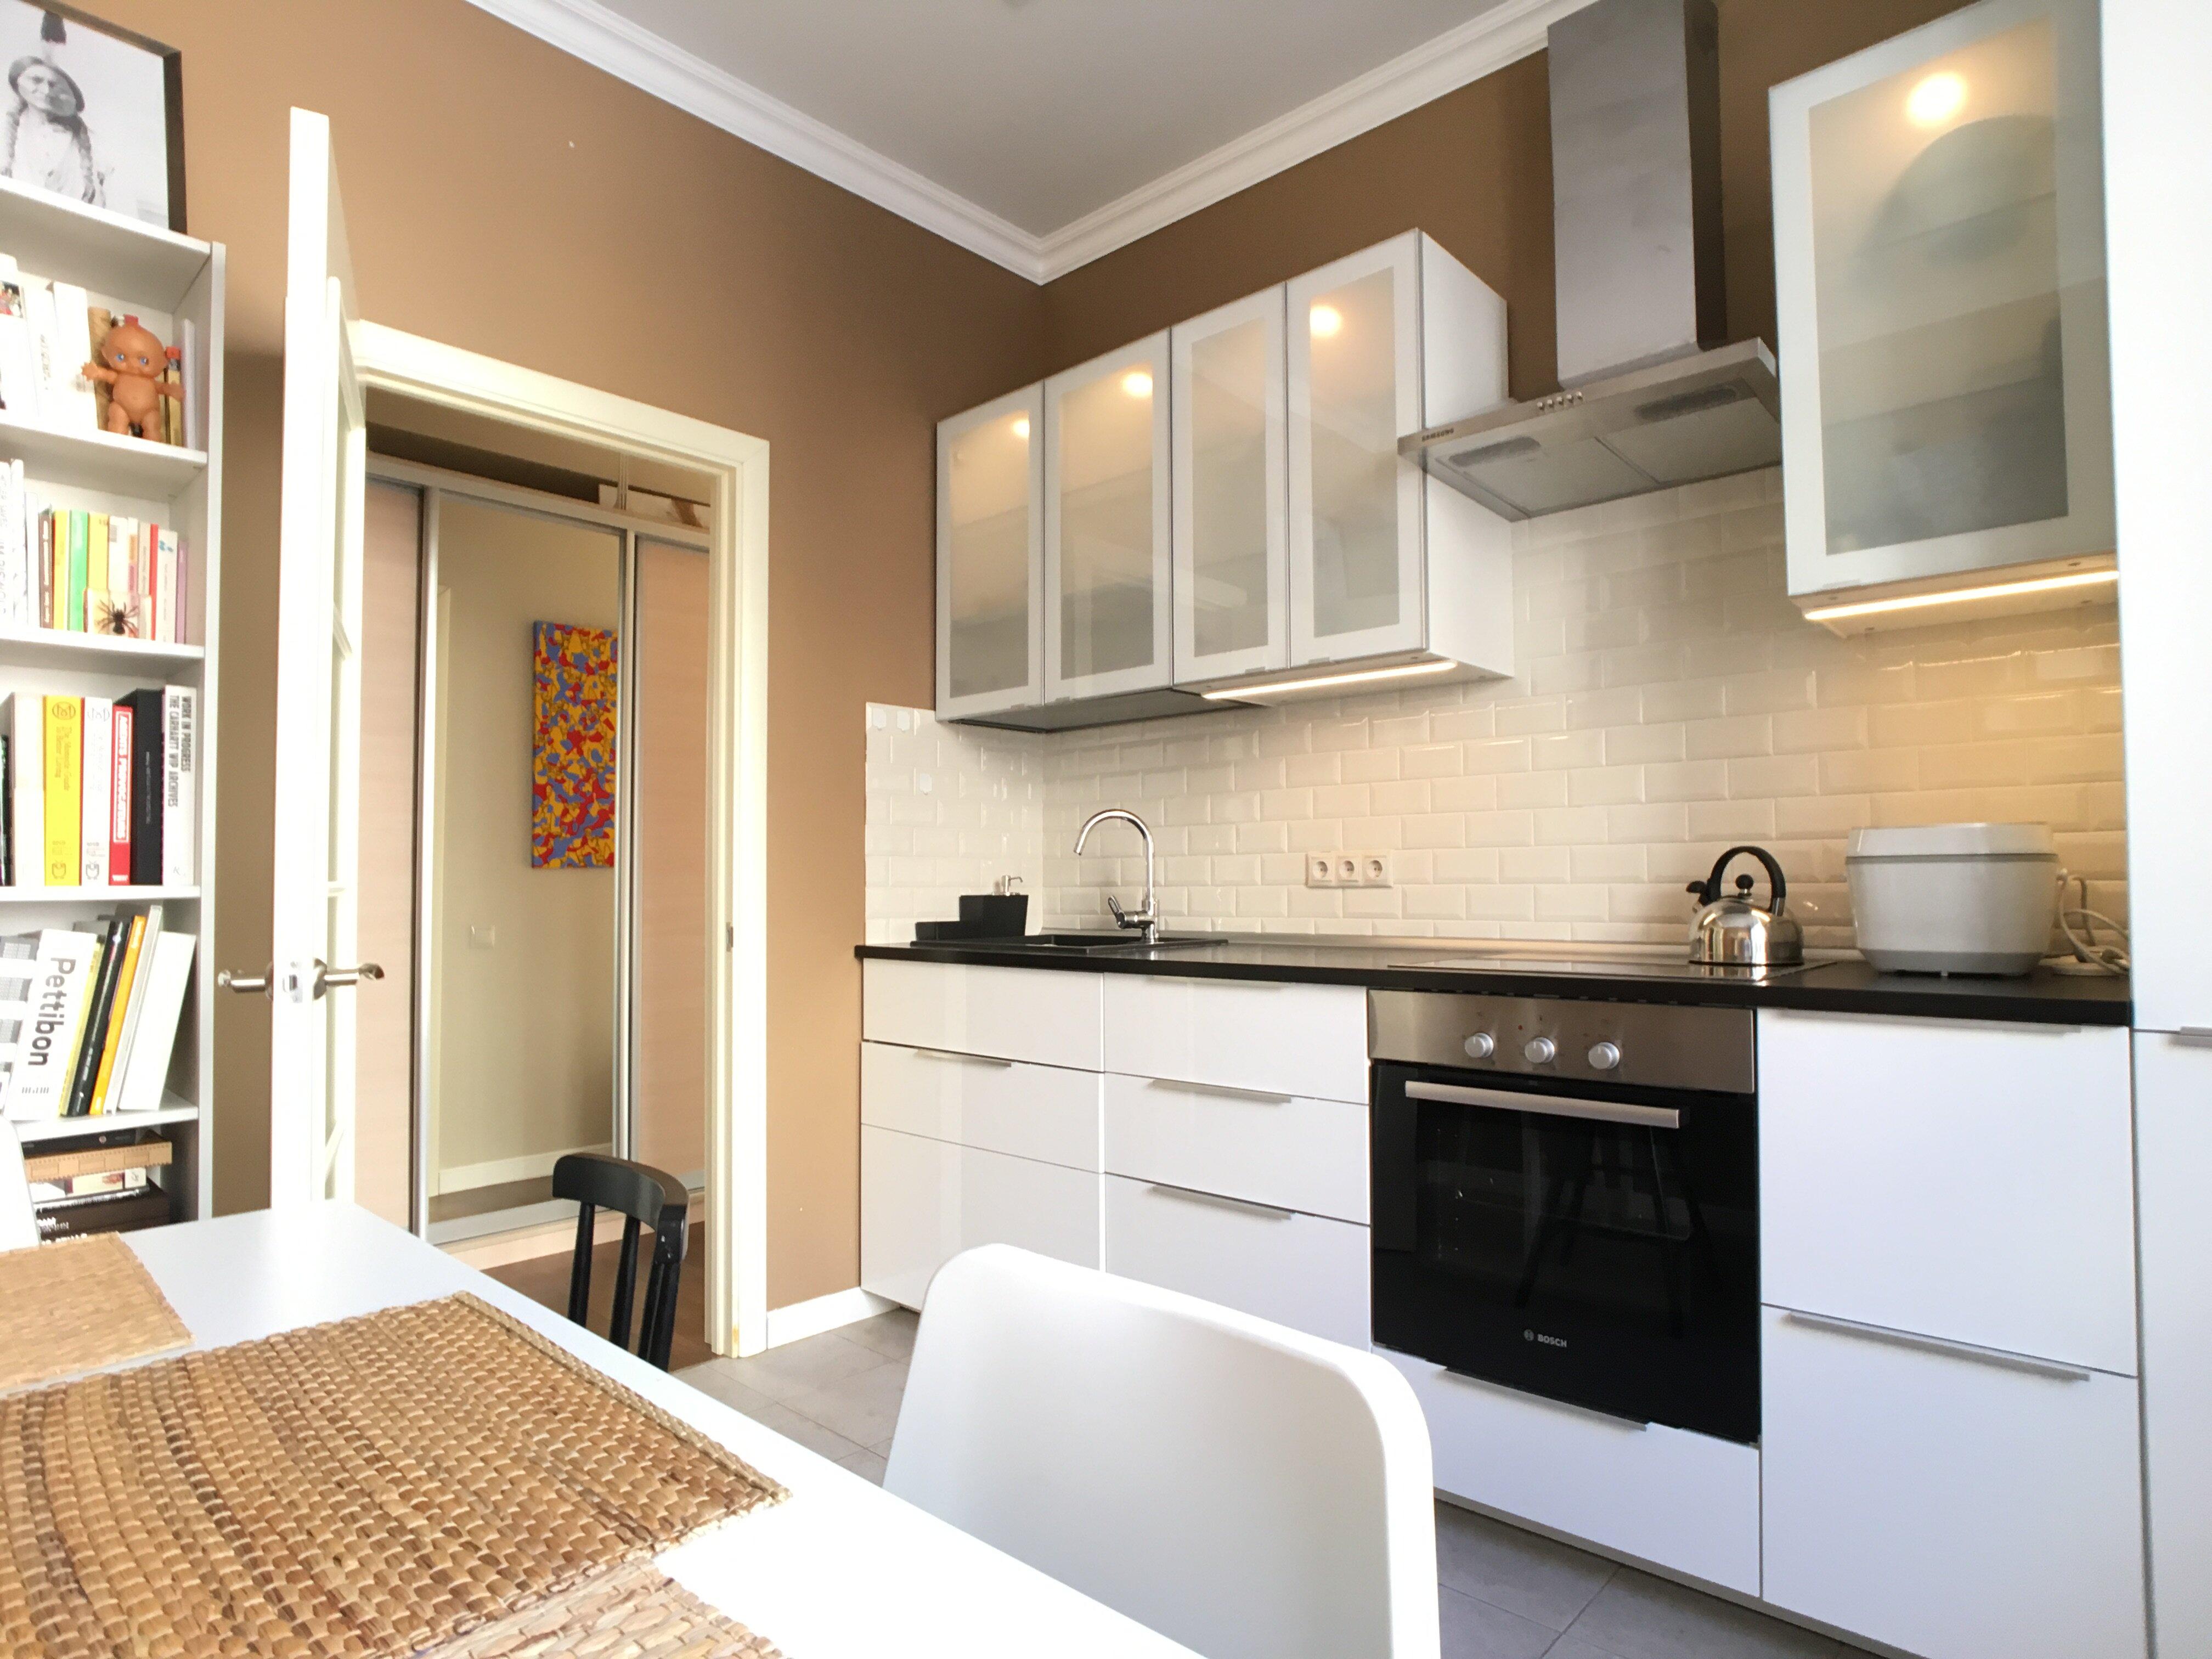 Семь столиц цены на квартиры